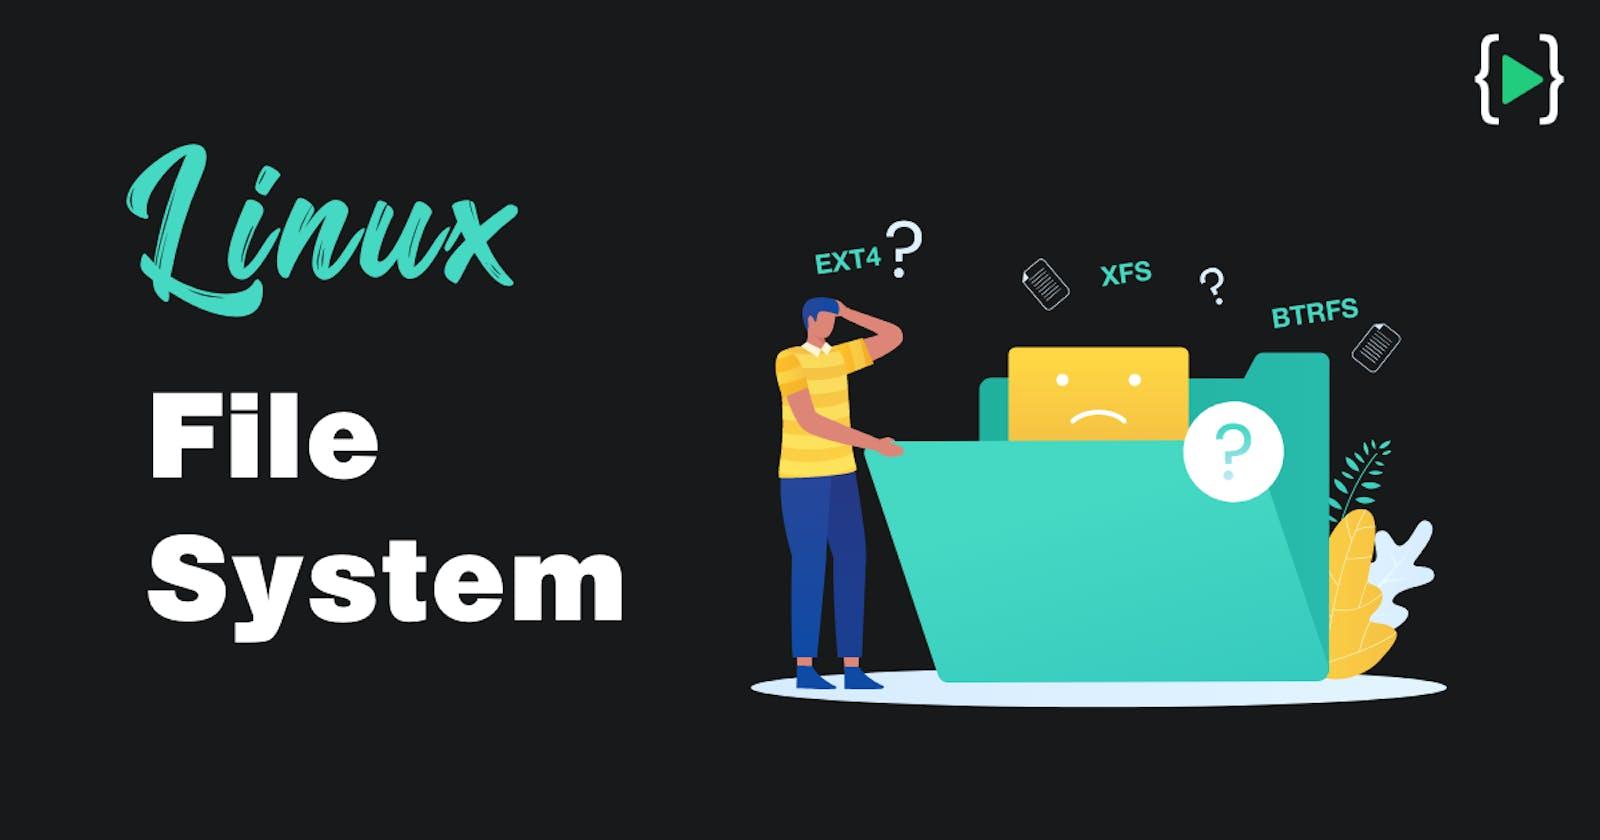 Understanding Linux File Systems - EXT4, XFS, BTRFS